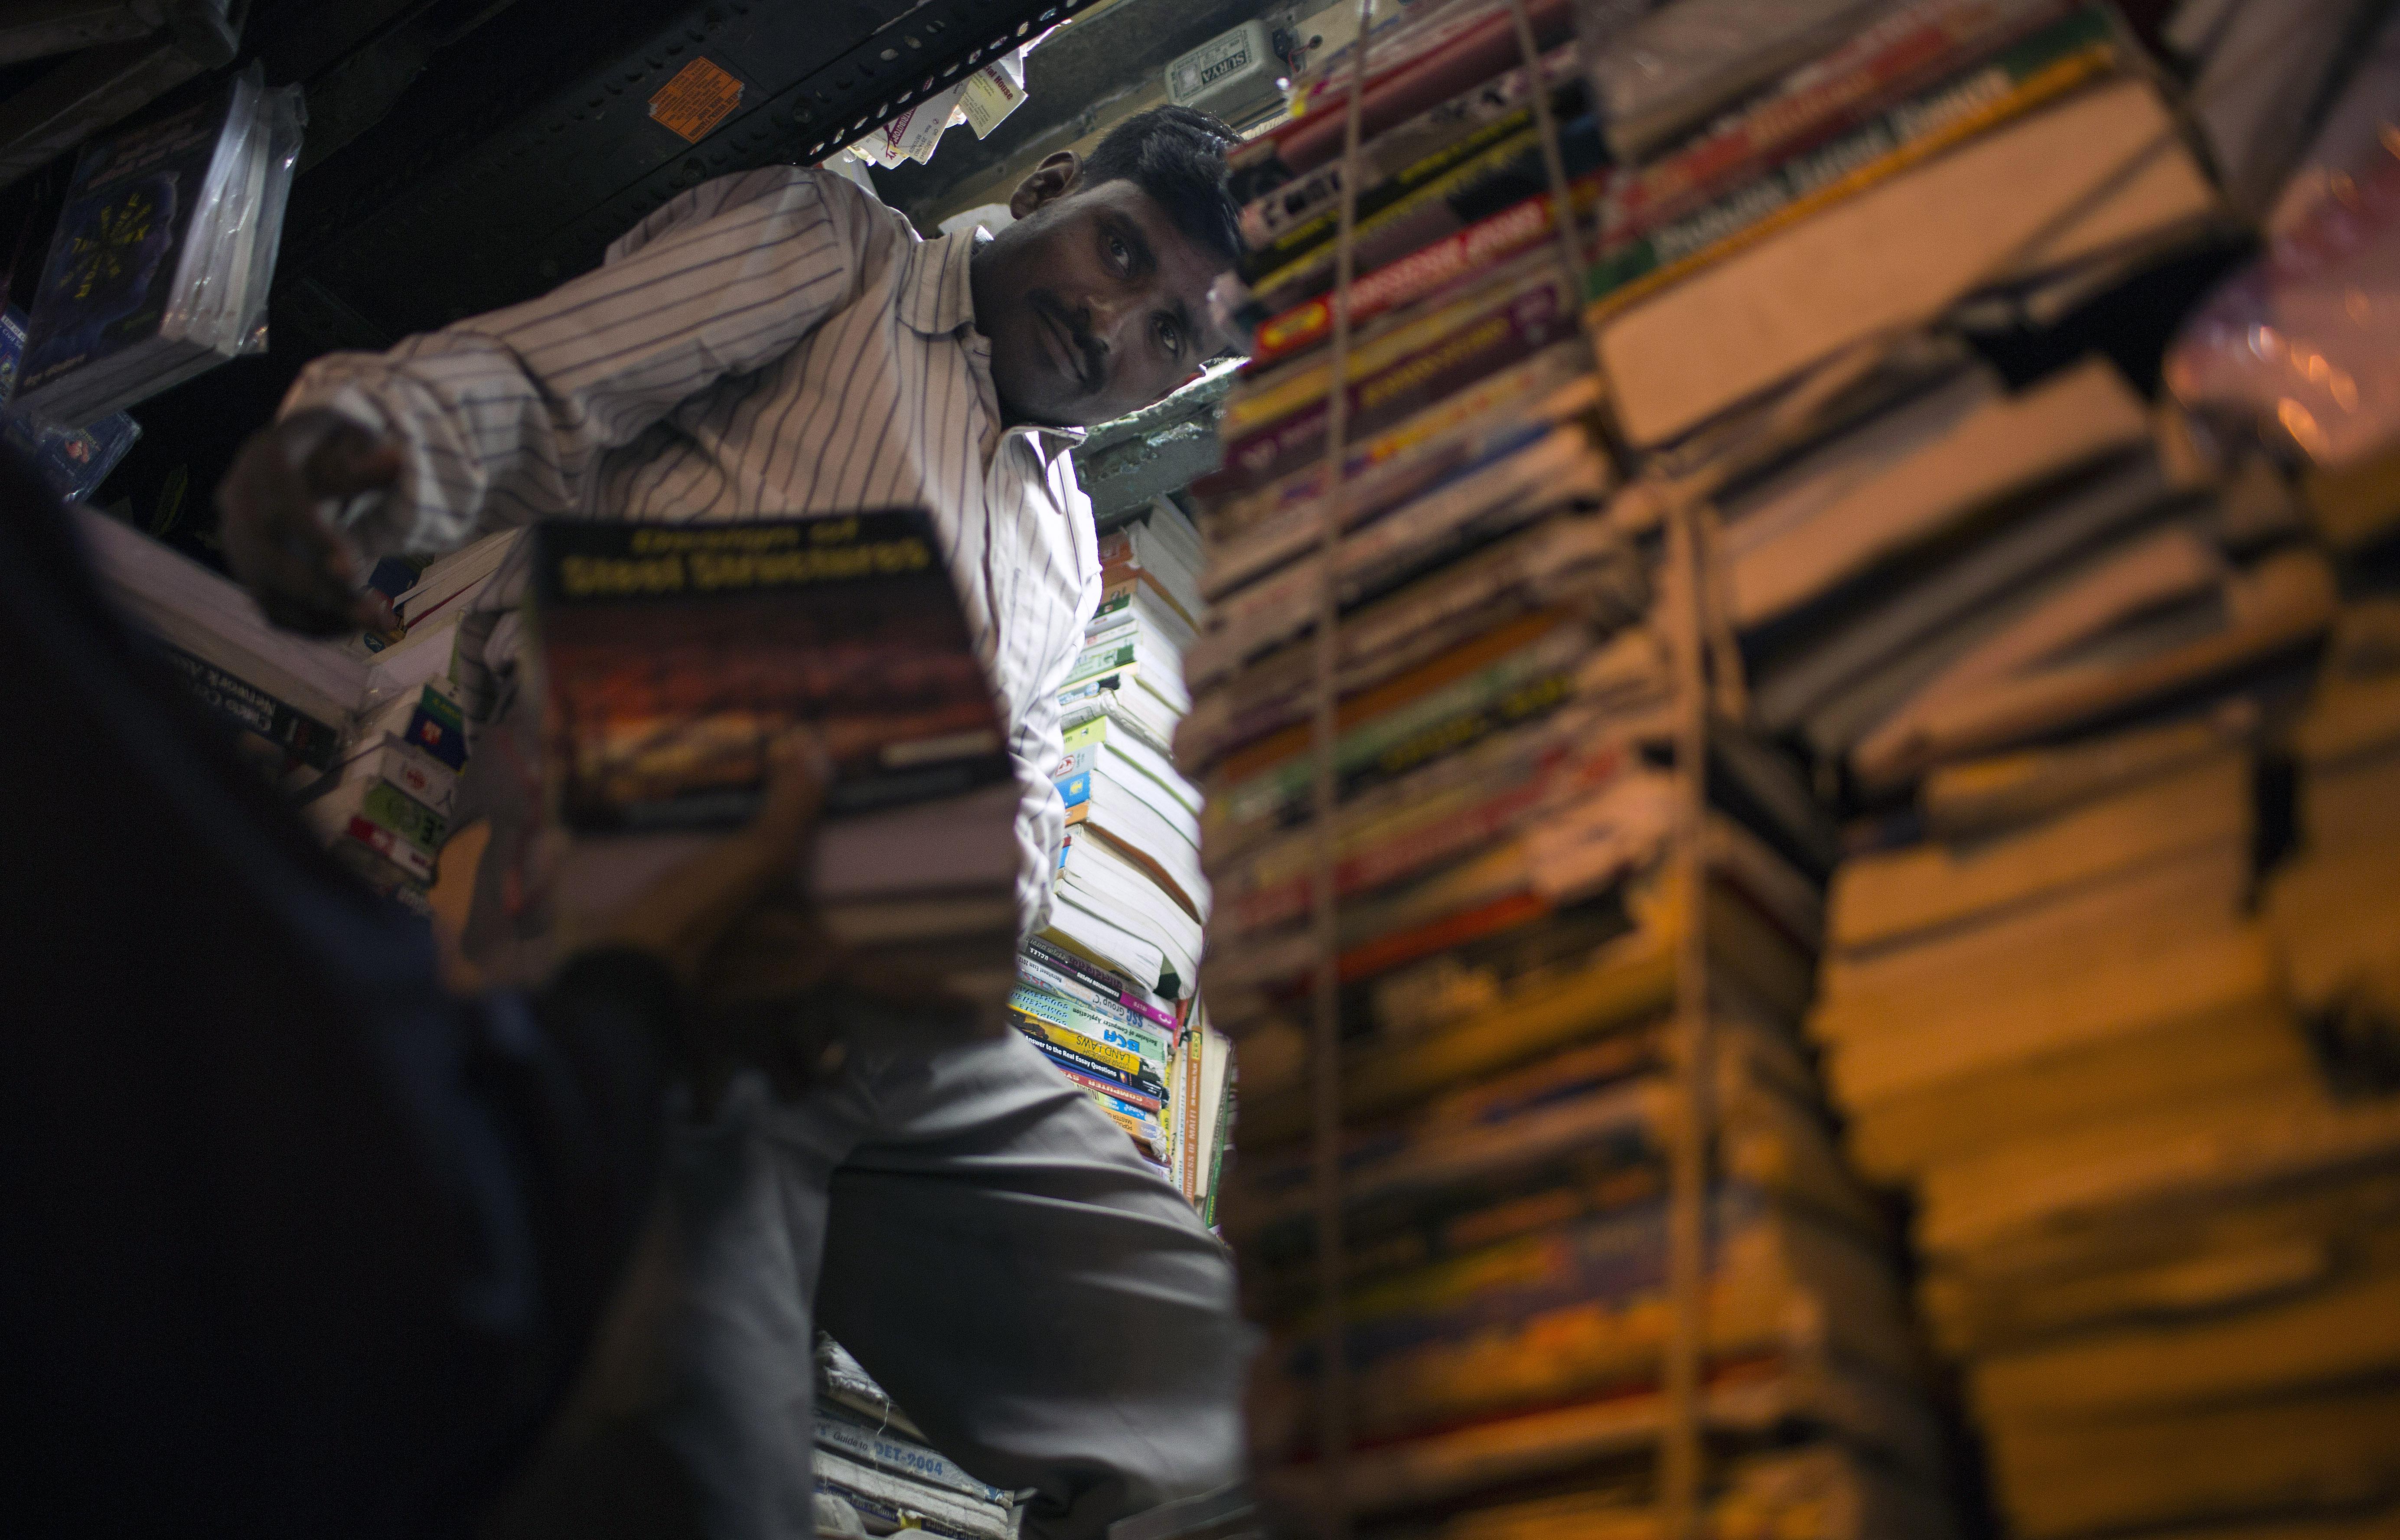 An Indian book vendor arranges items at his shop in New Delhi's Old Quarter on Jan. 30, 2013.